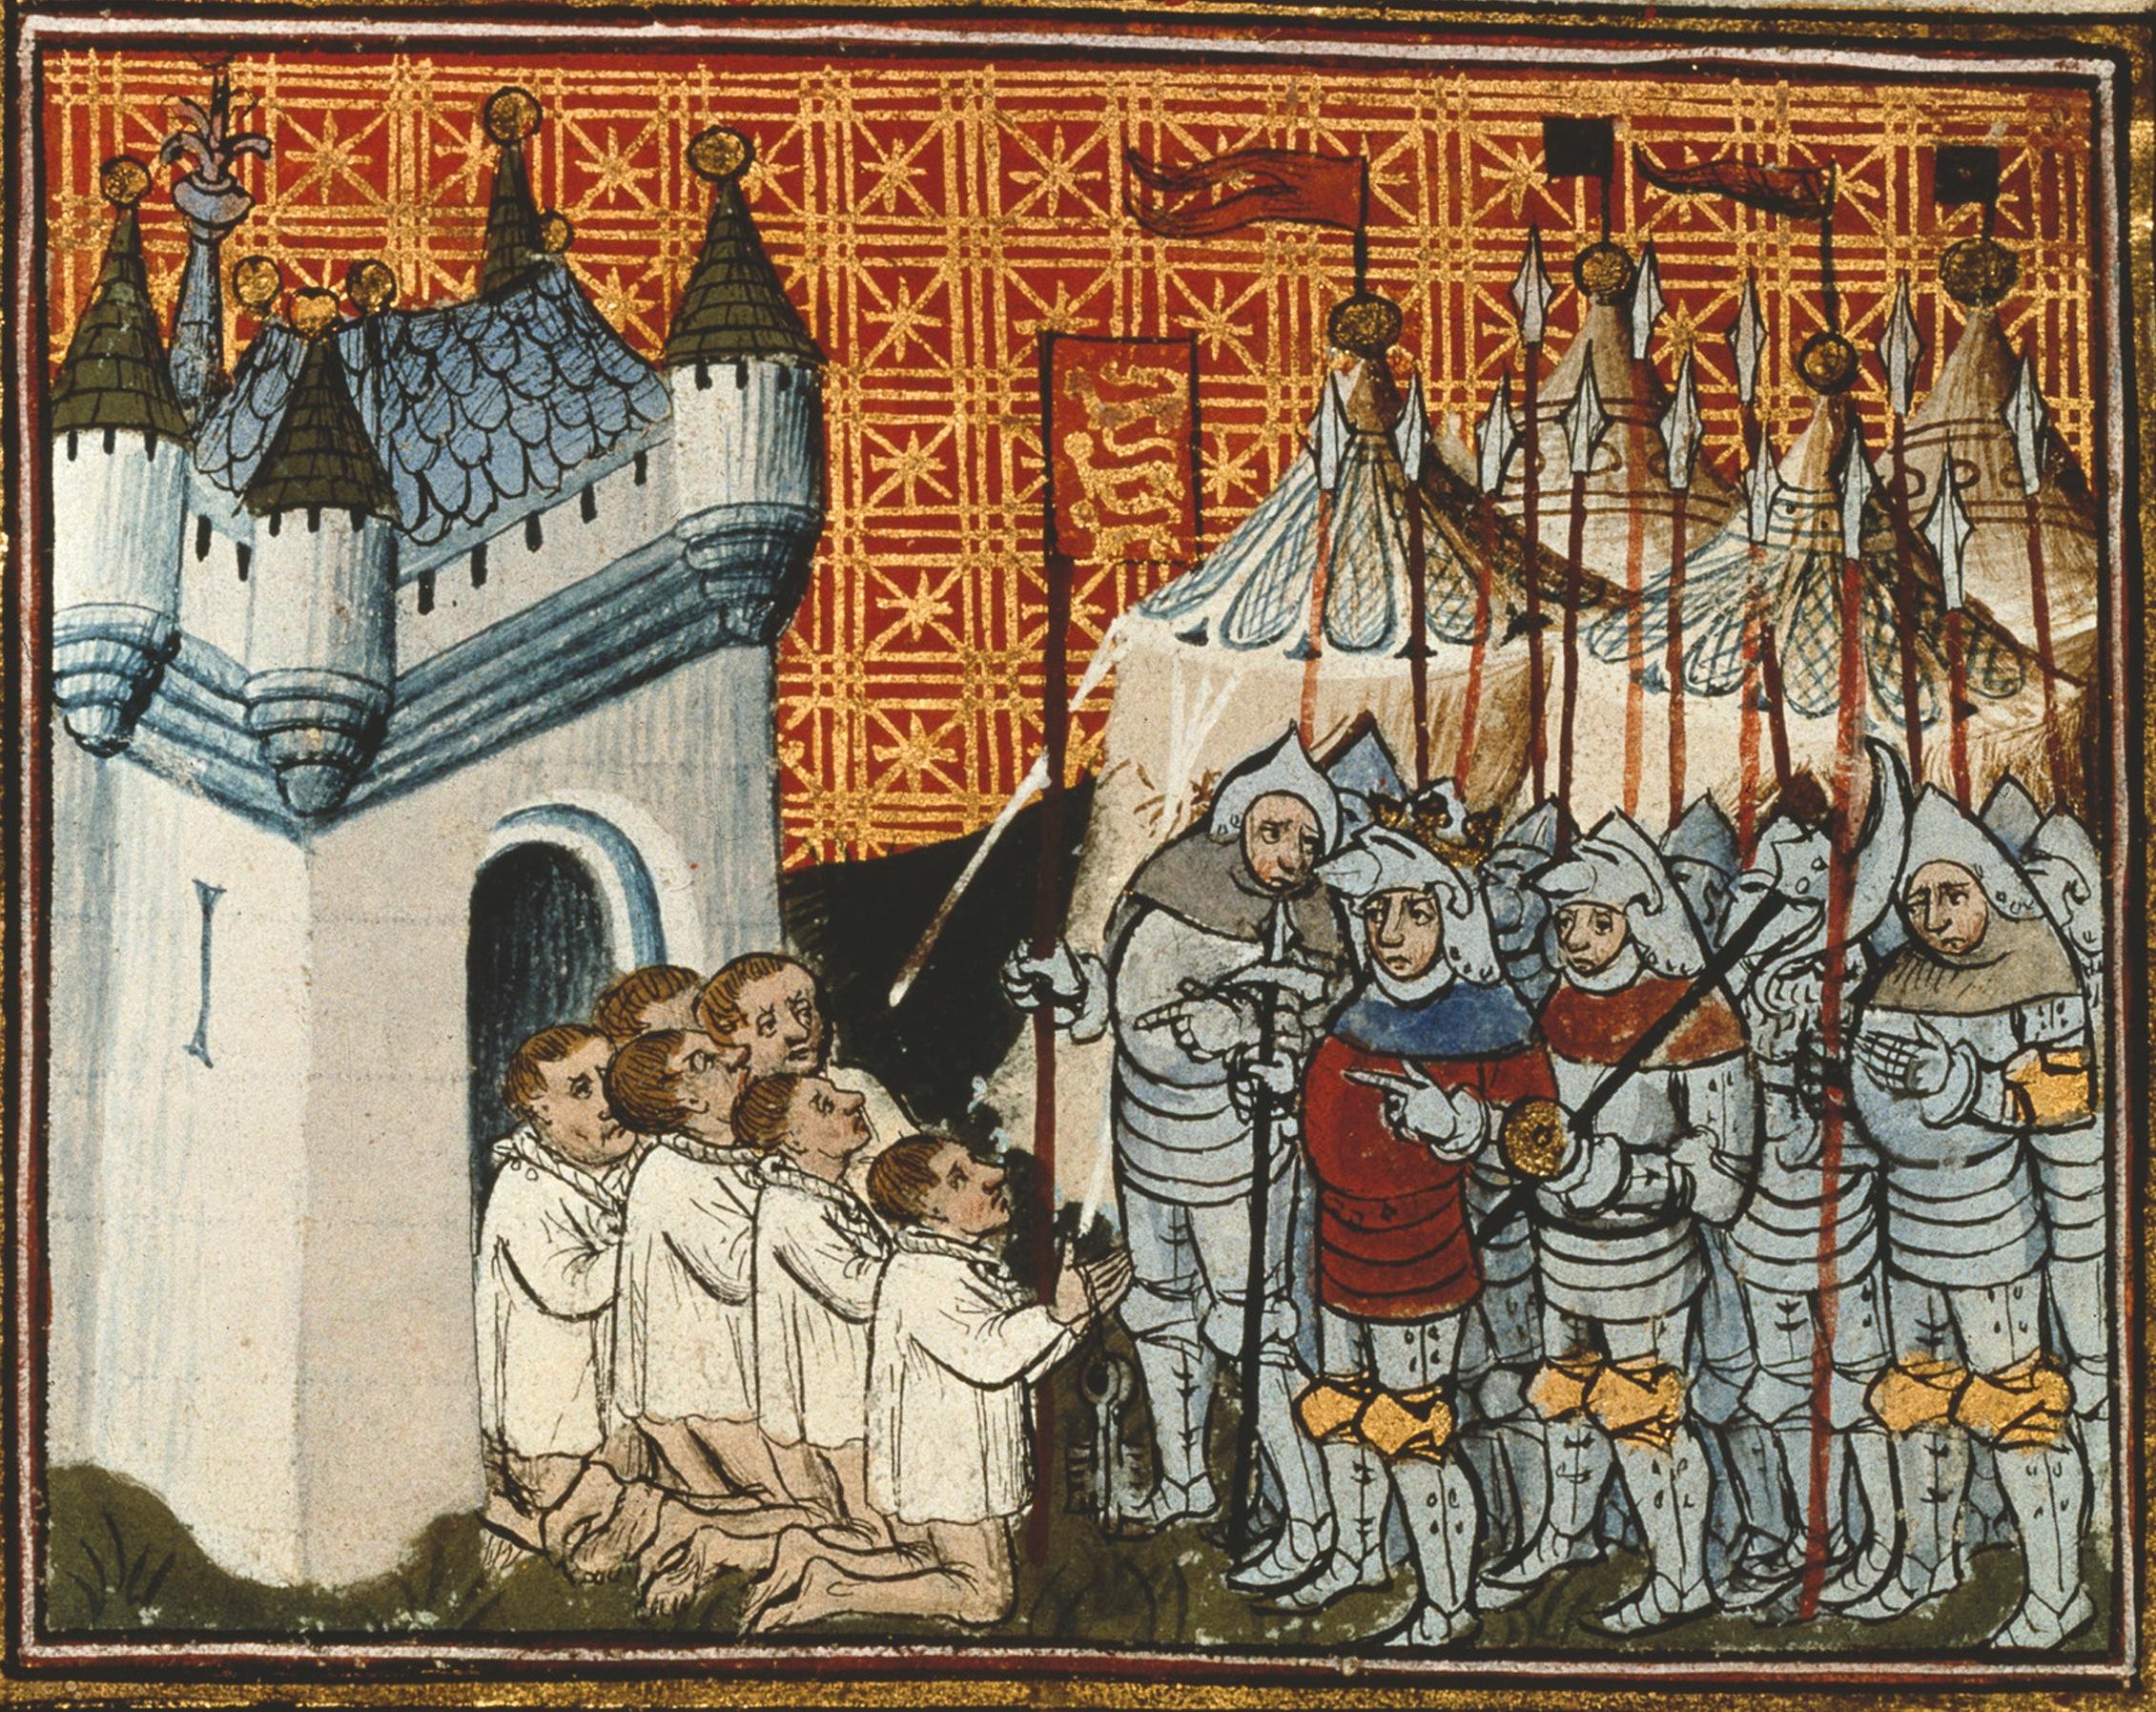 Calais surrenders to Edward III